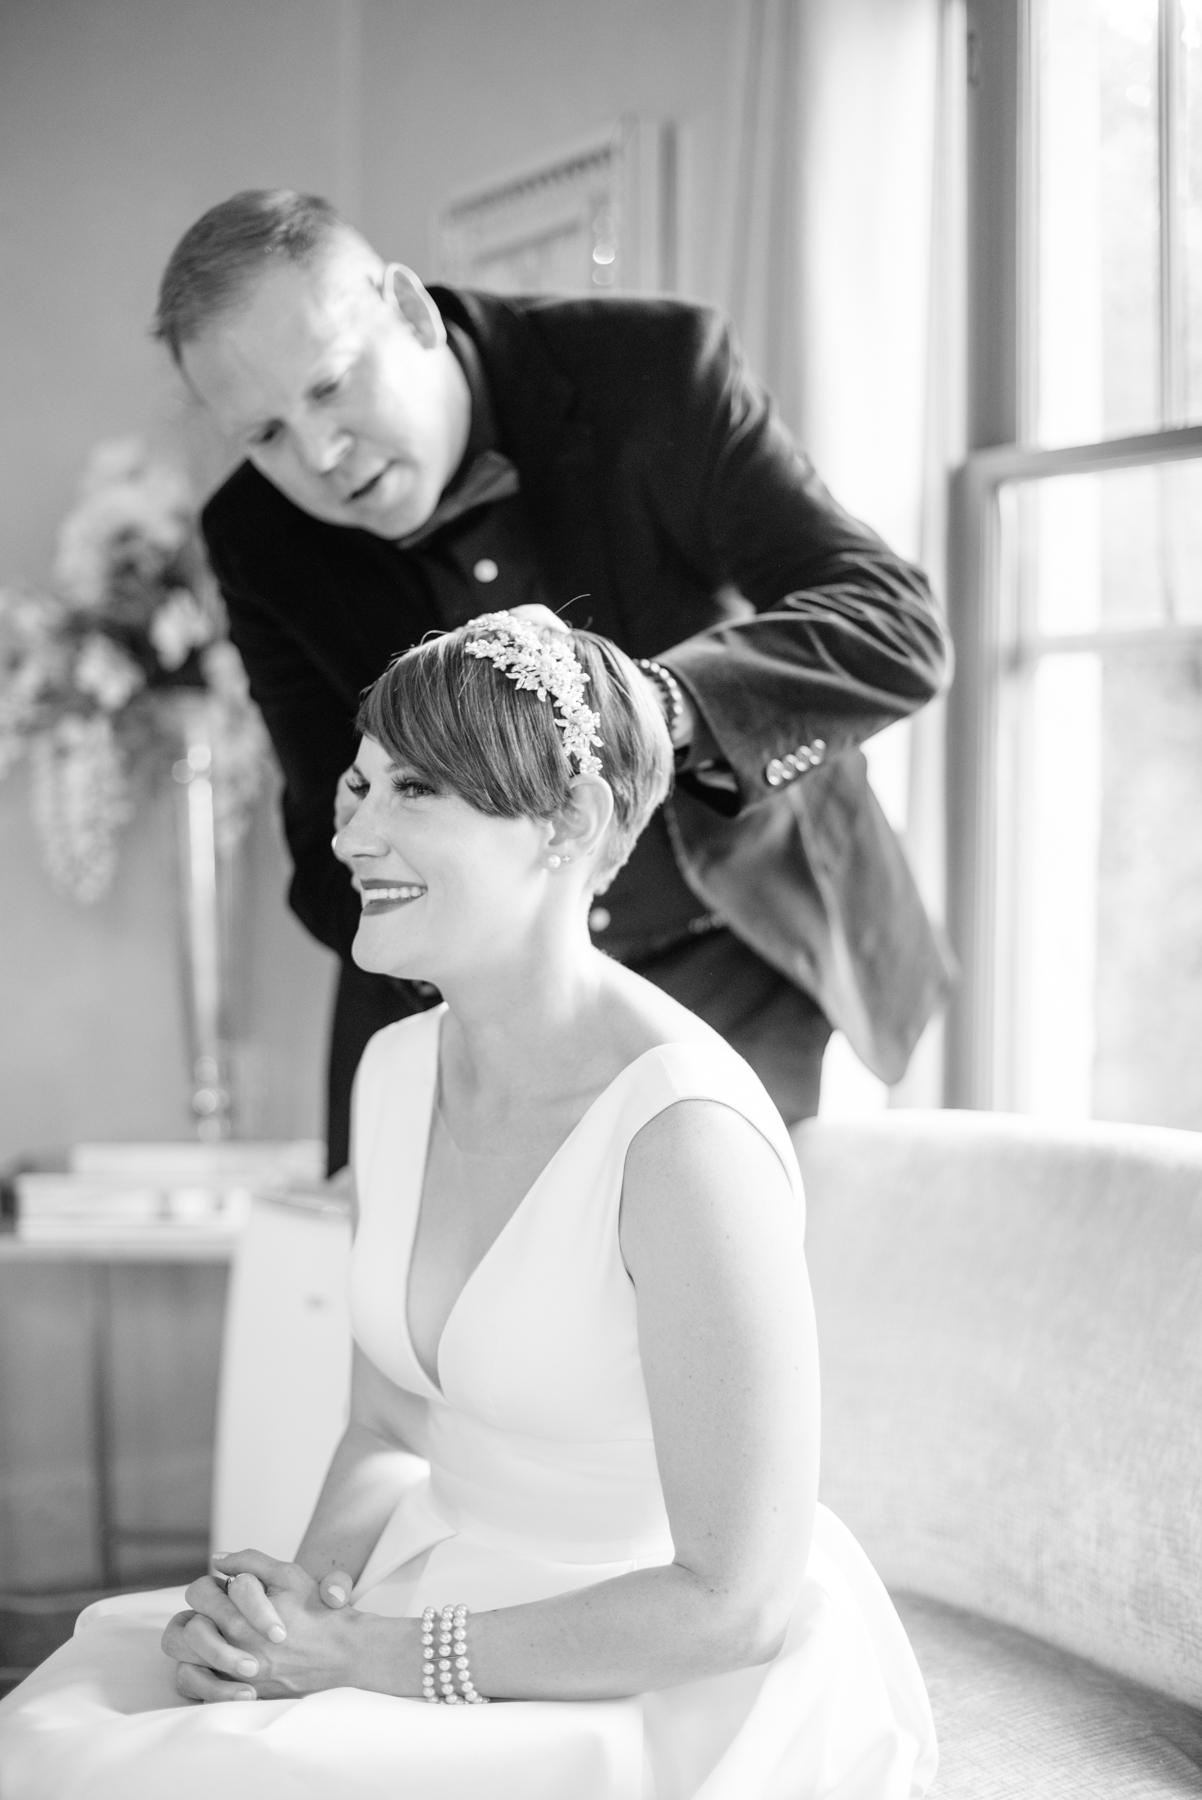 Secret Garden Event Center Wedding - Meredith Amadee Photography-10-2.jpg